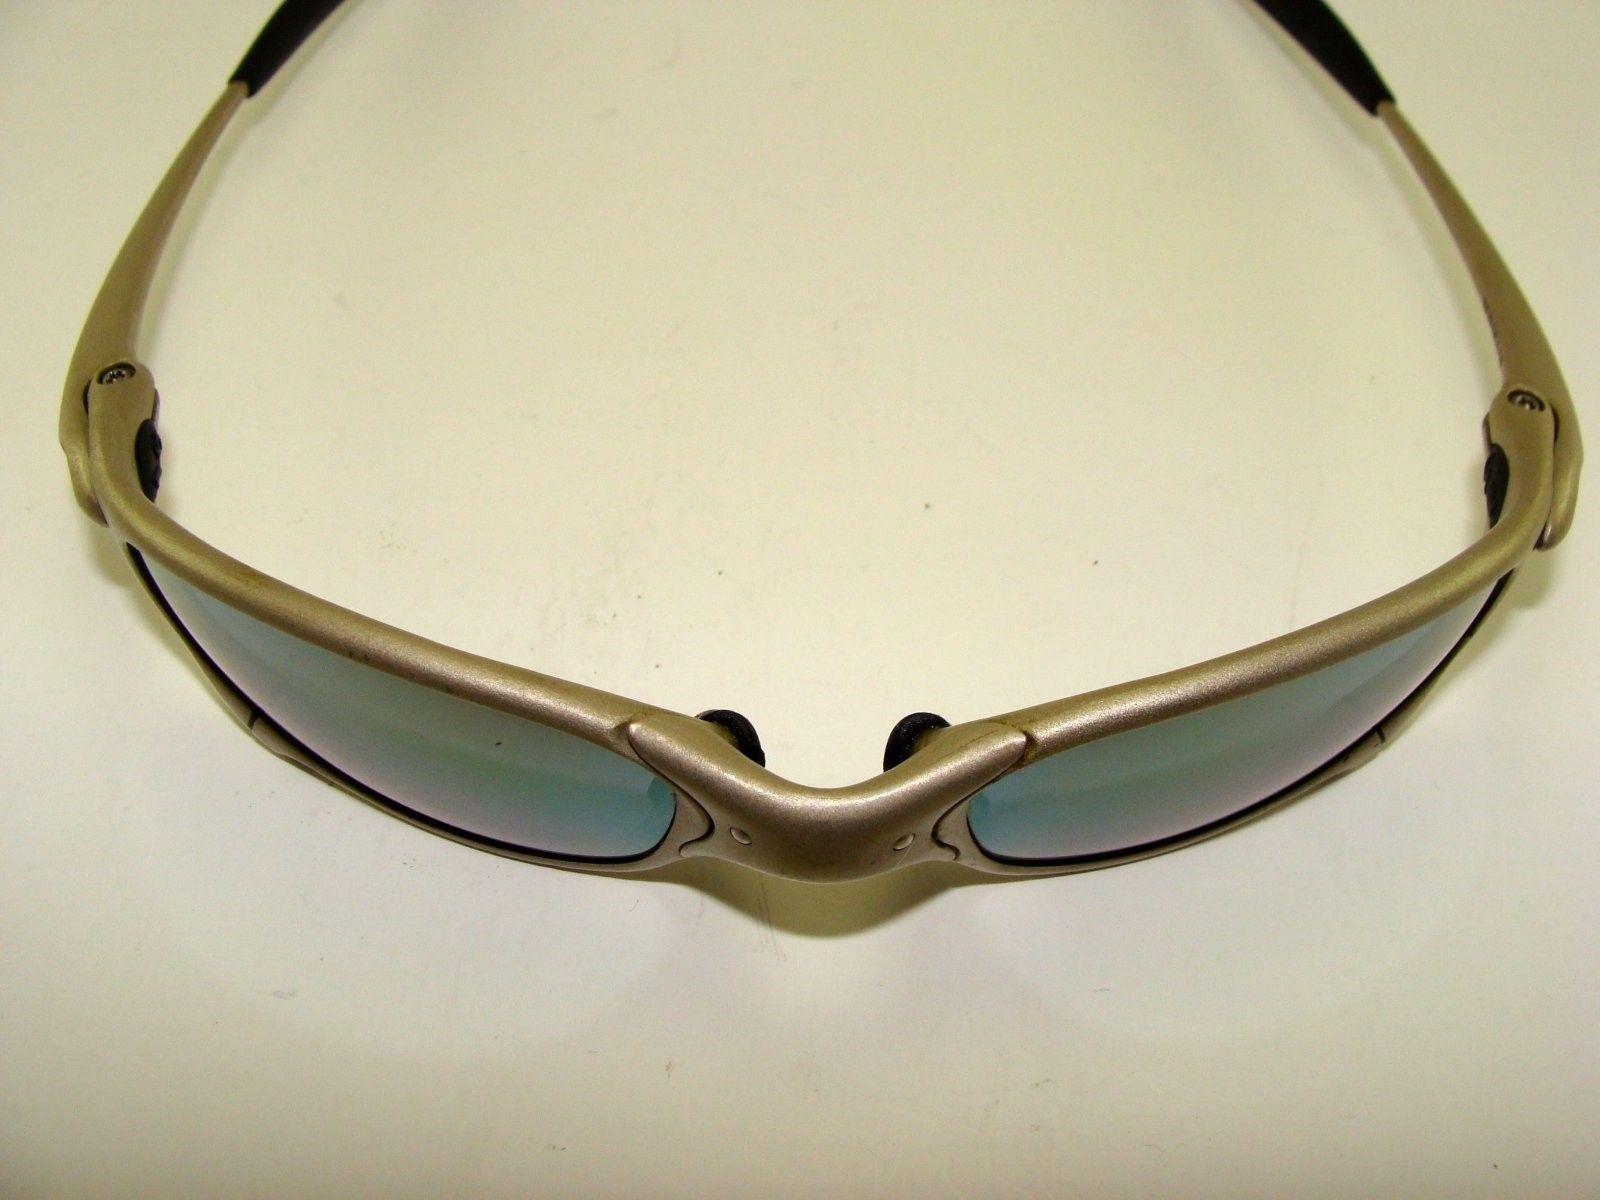 1st Gen Juliet Plasma Emerald 04-115 $400 Shipped CONUS - Oakley Emerald Juliet07.jpg